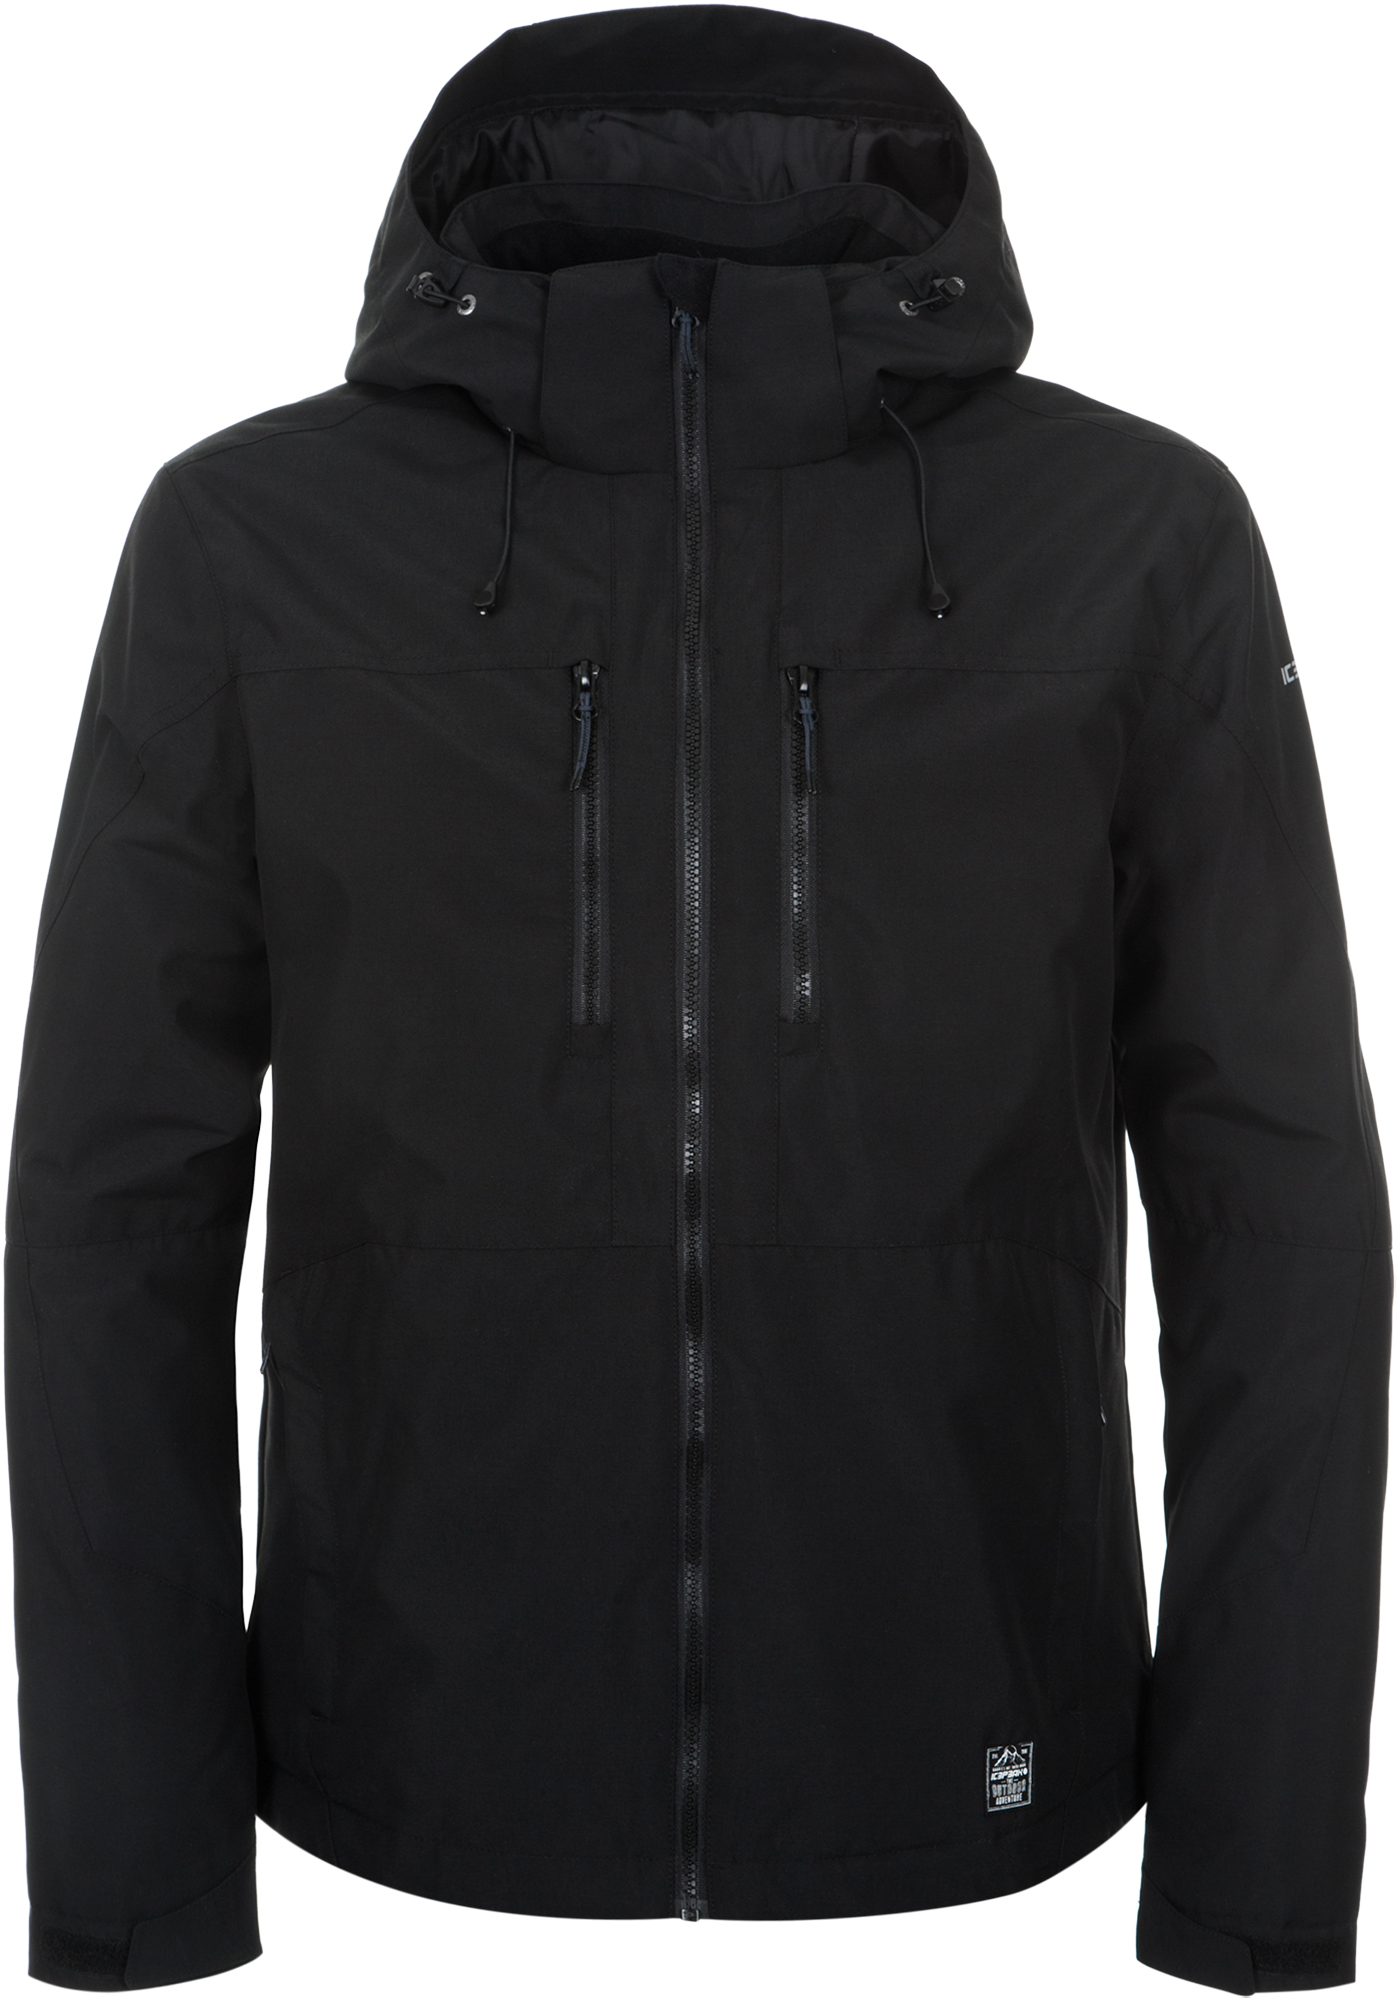 IcePeak Куртка утепленная мужская IcePeak Valton, размер 54 цена 2017